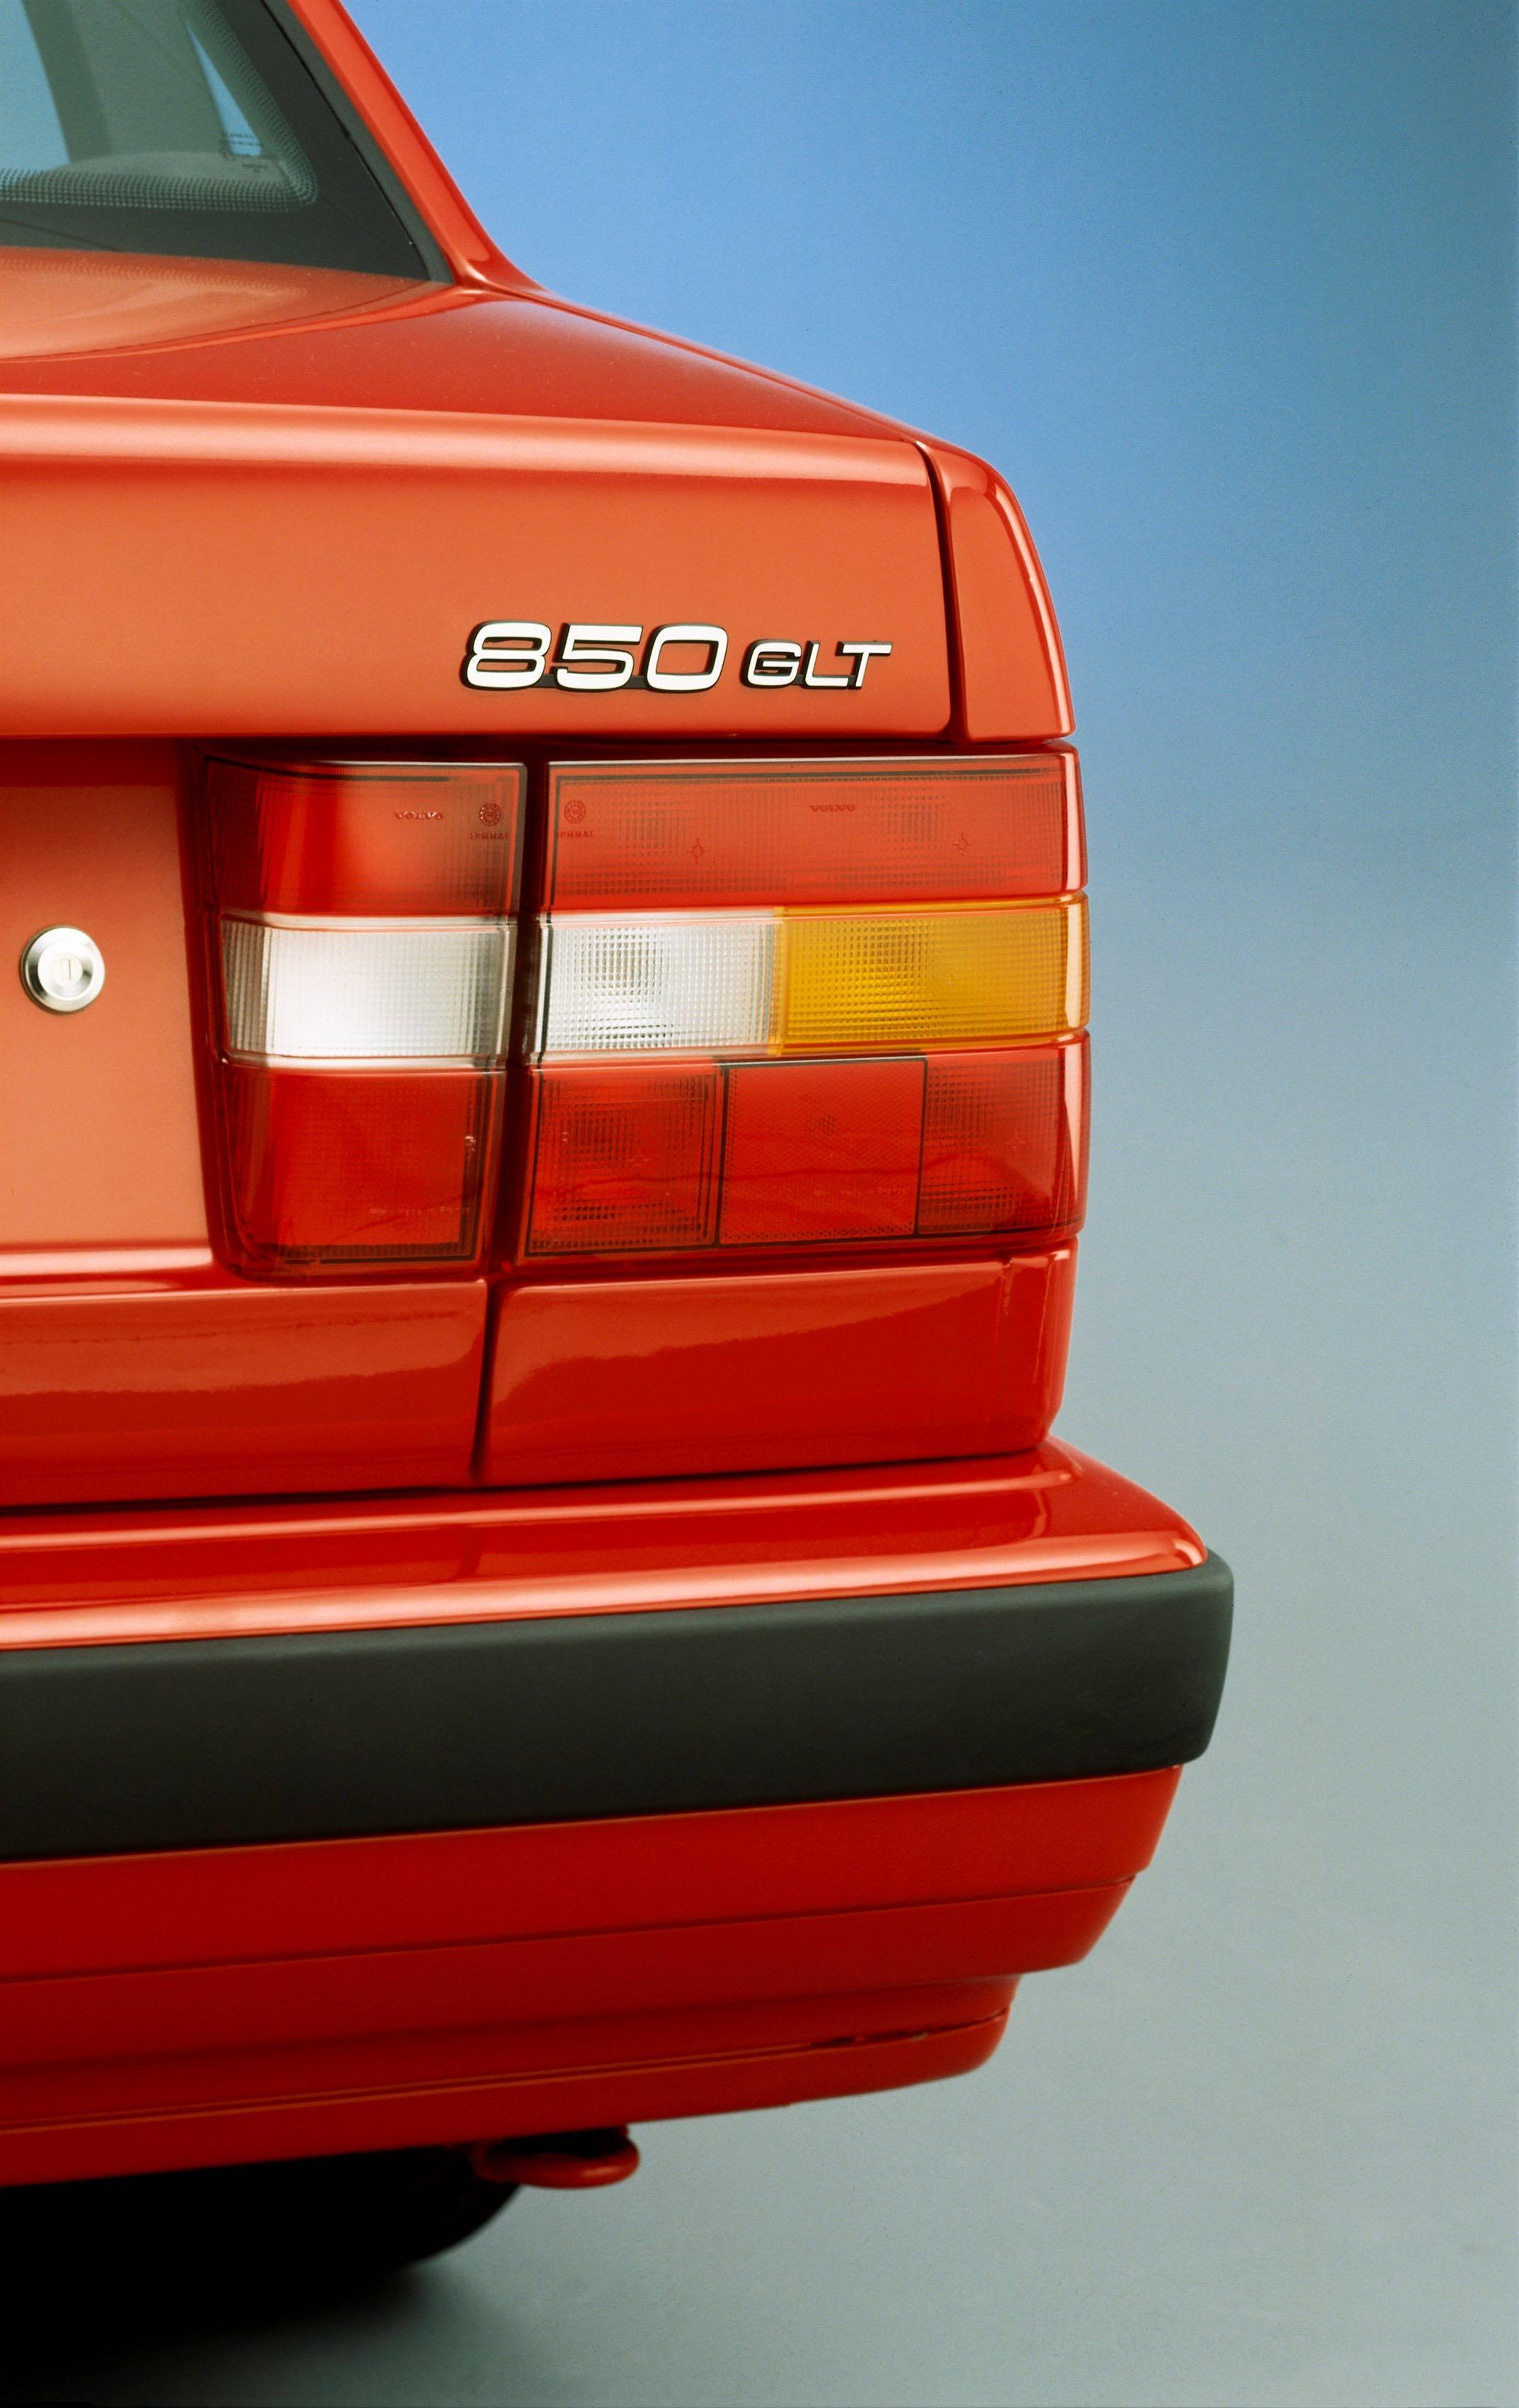 Volvo 850 -  850, 854, 1992, Detail, Exterior, Historical, Images, sedan